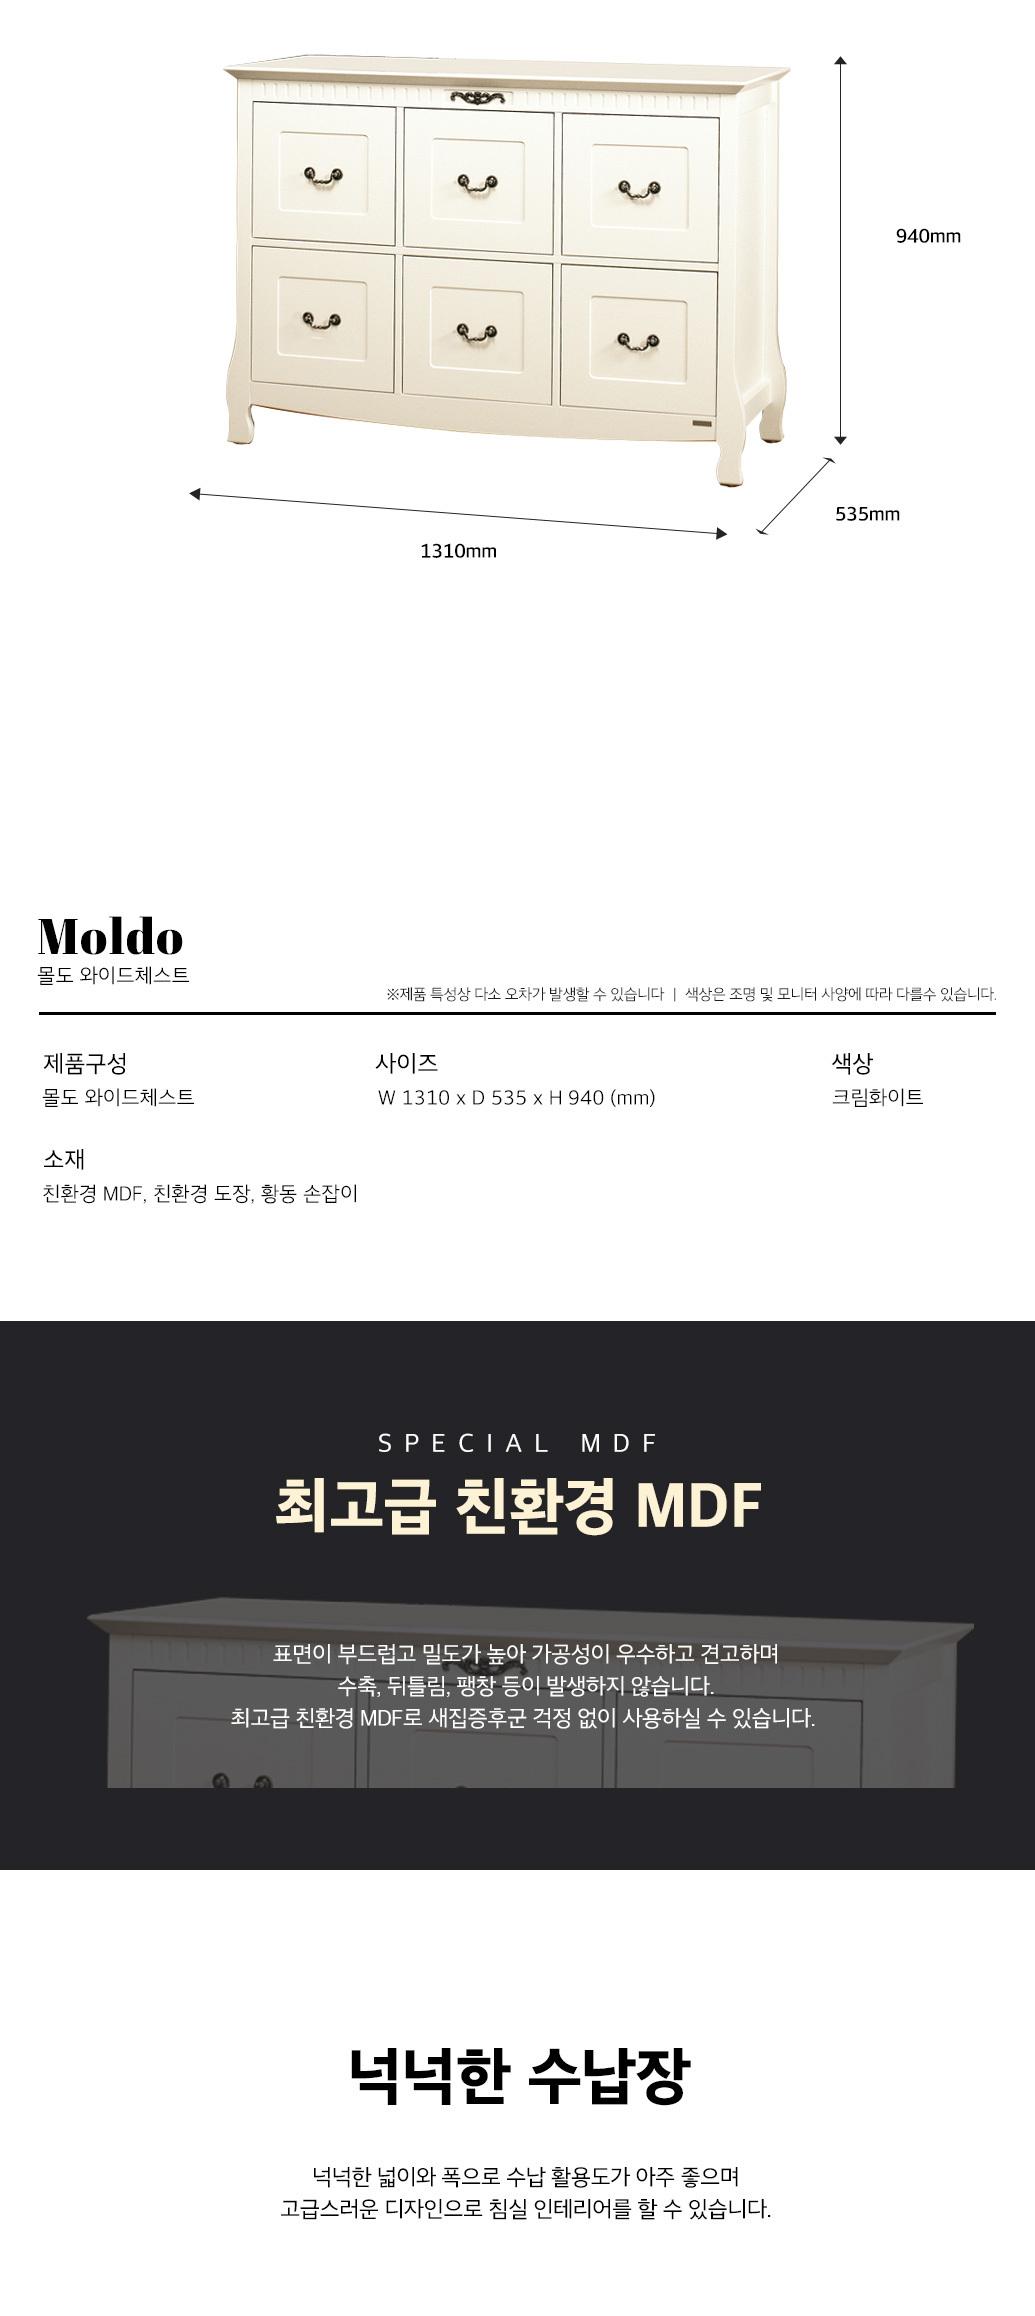 moldo_wide_02.jpg